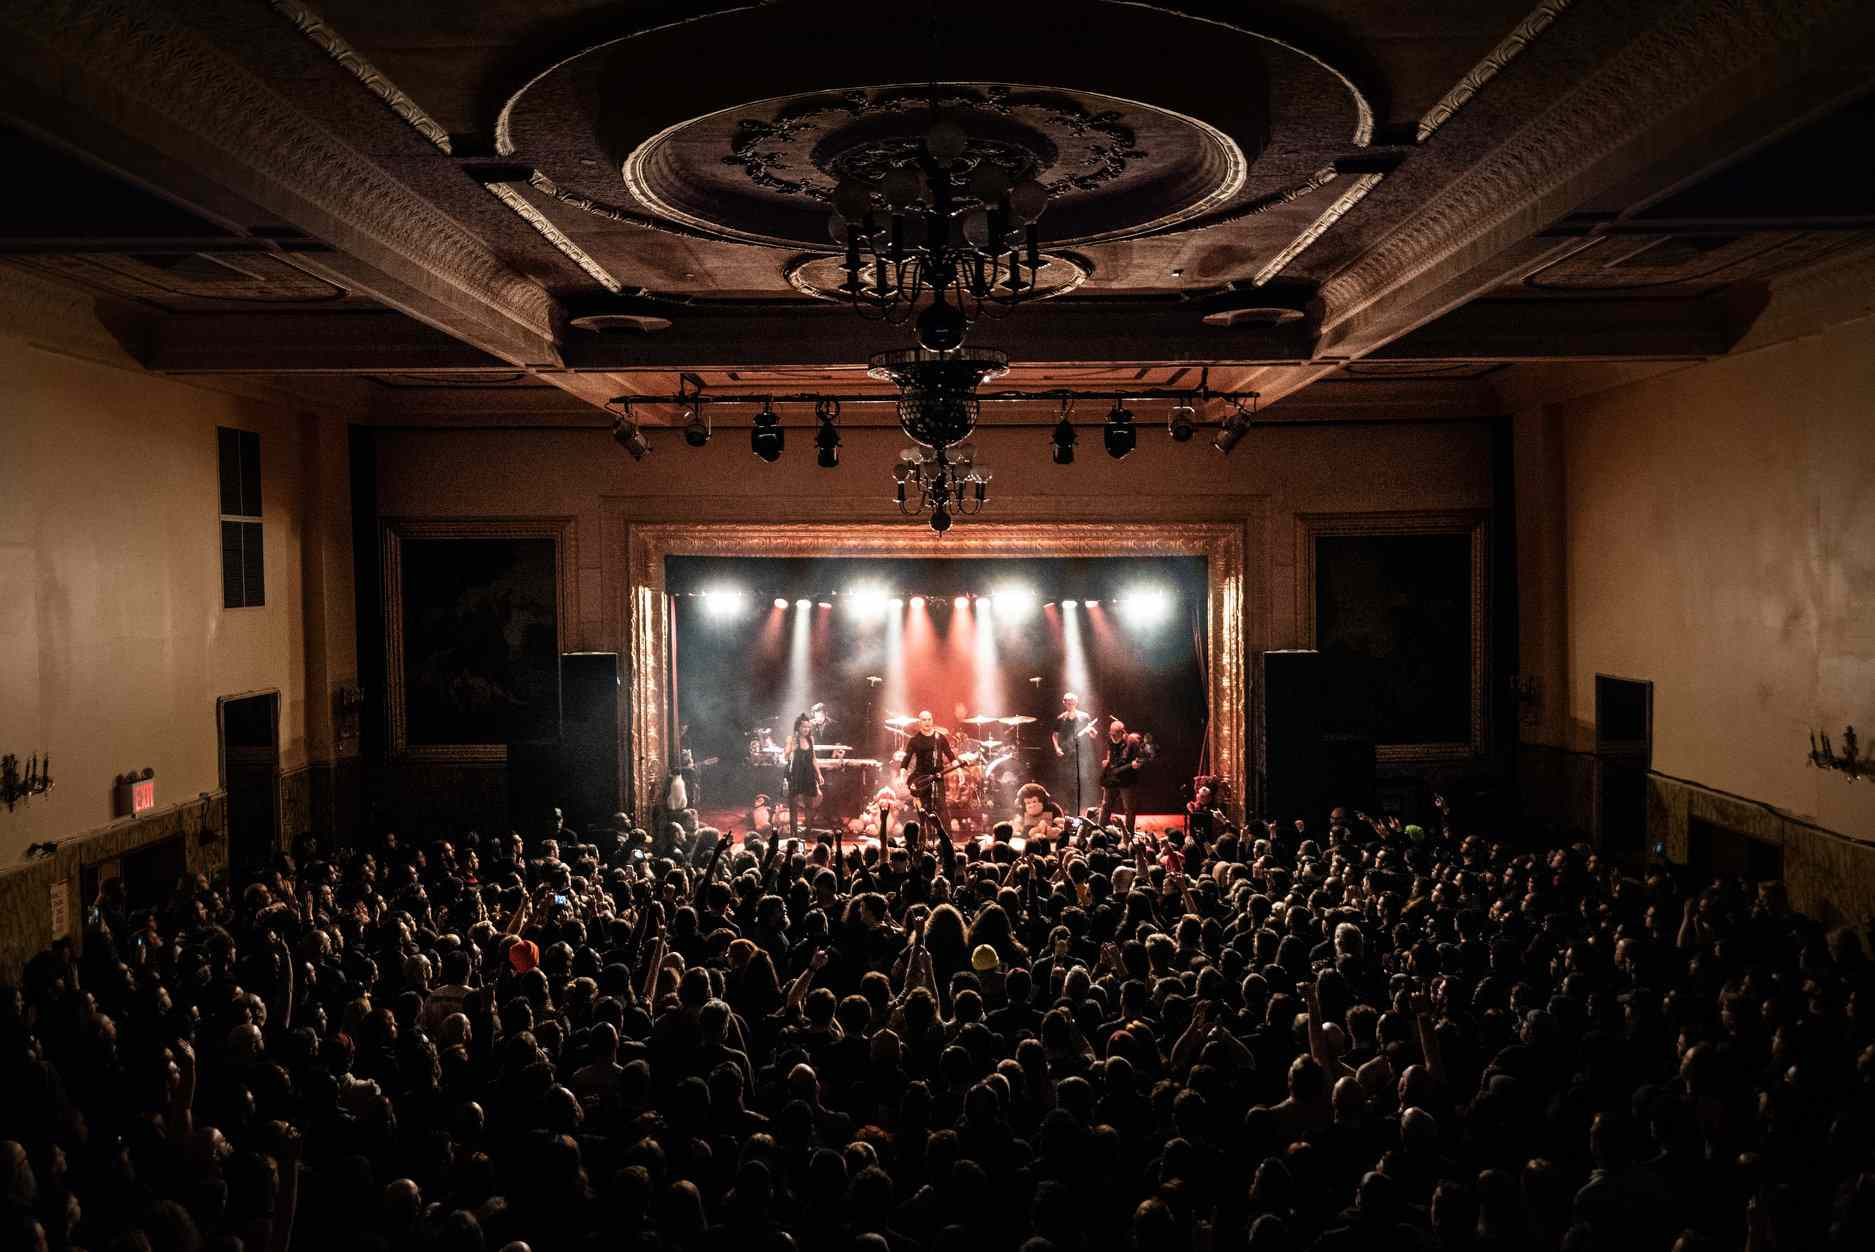 Concert at Warsaw